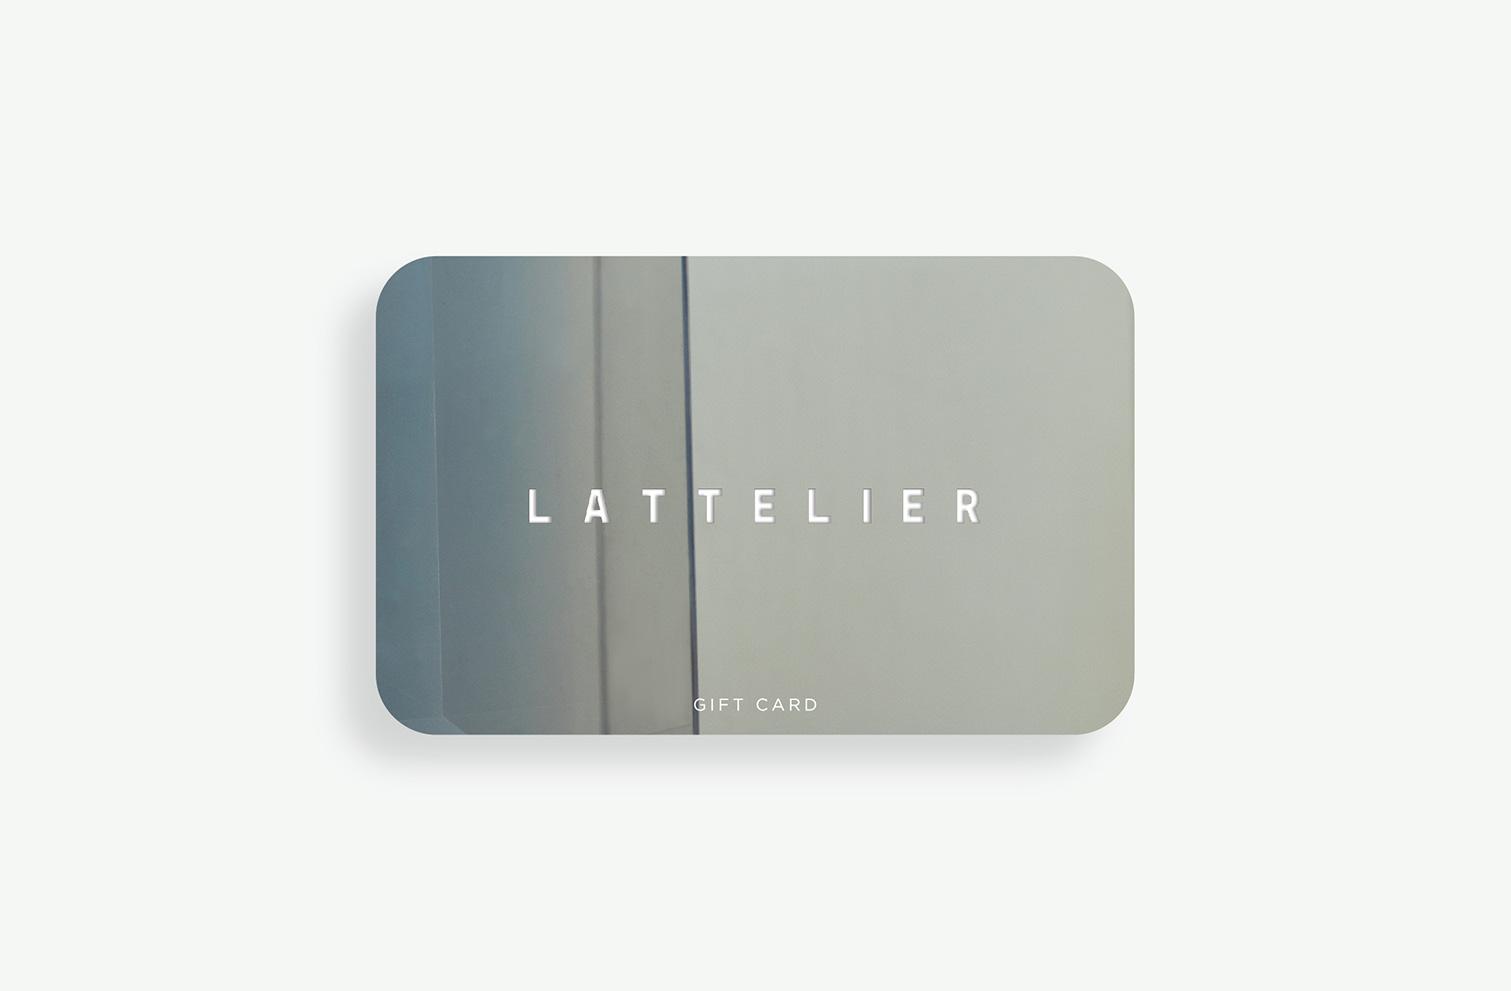 Latt gift card-100